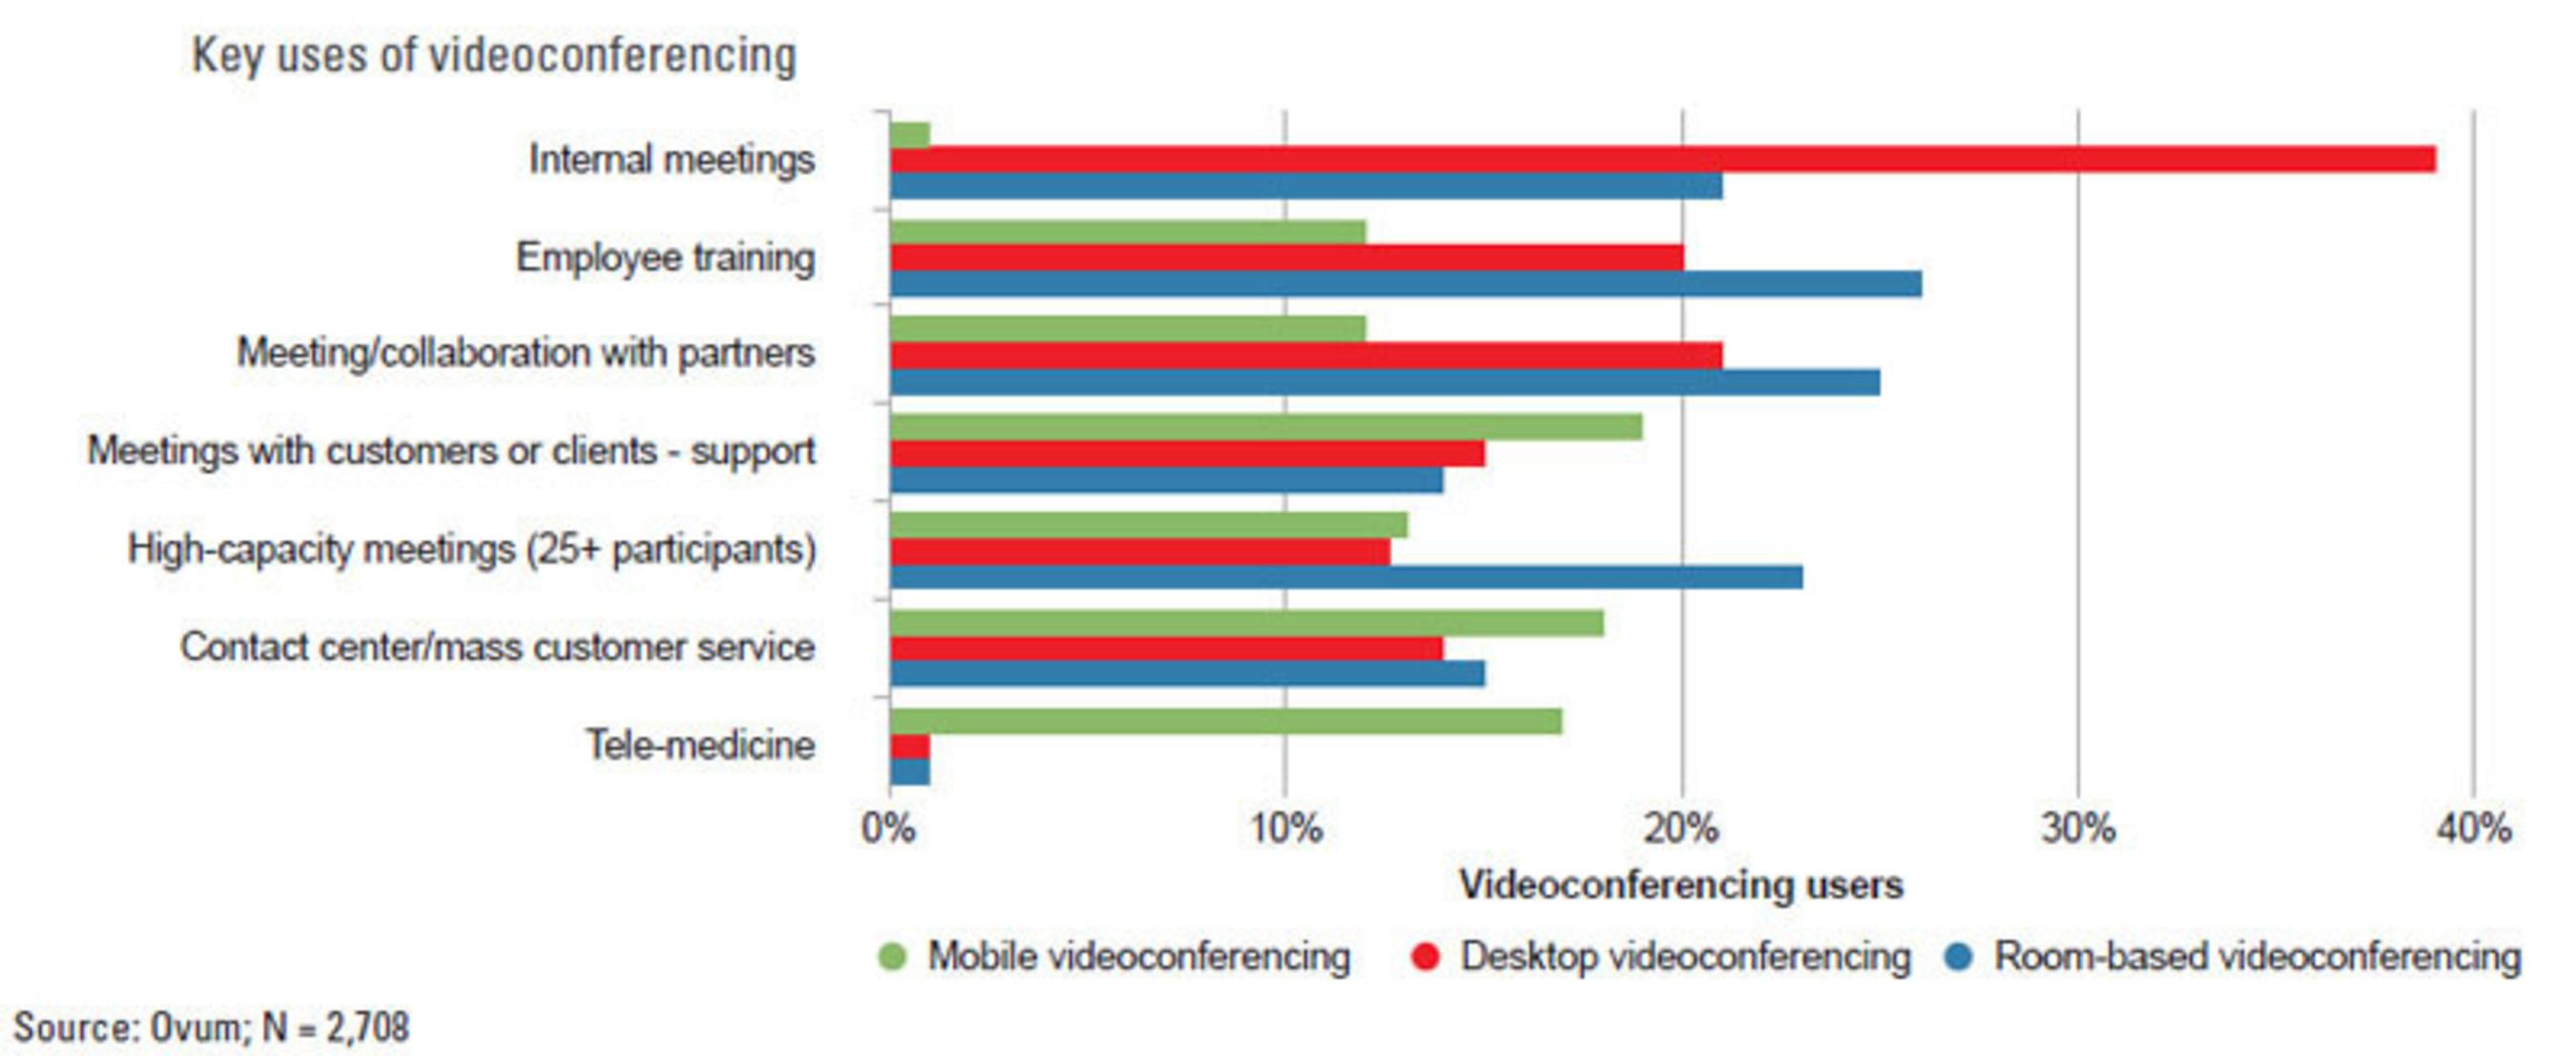 Key uses of videoconferencing